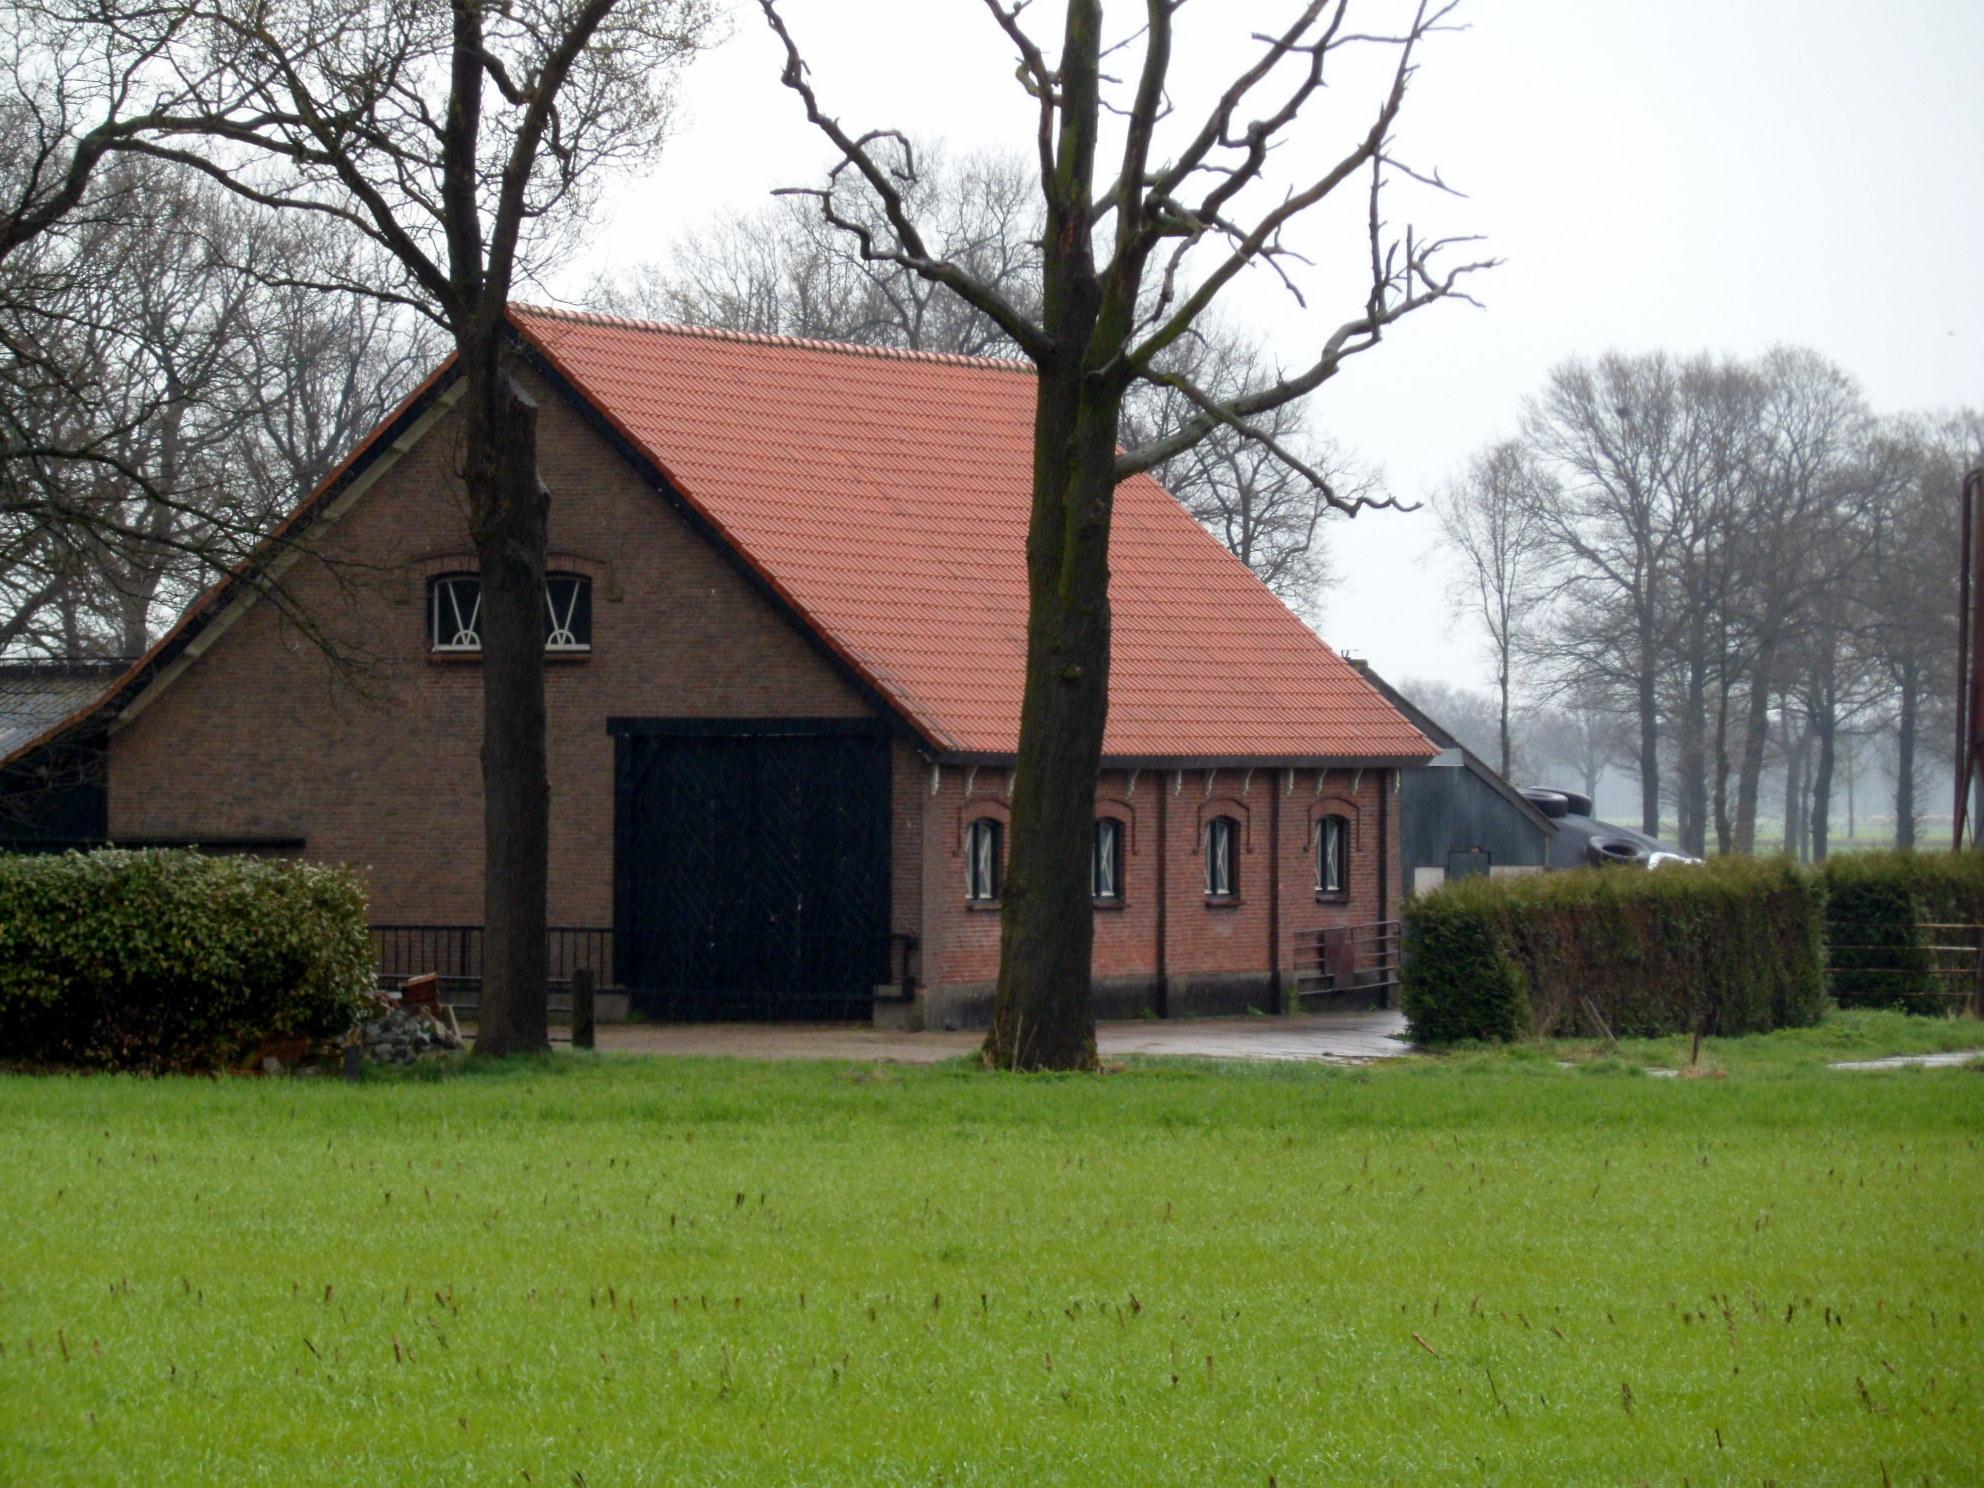 File:Stal, Hoeksestraat 27 Schijf.JPG - Wikimedia Commons